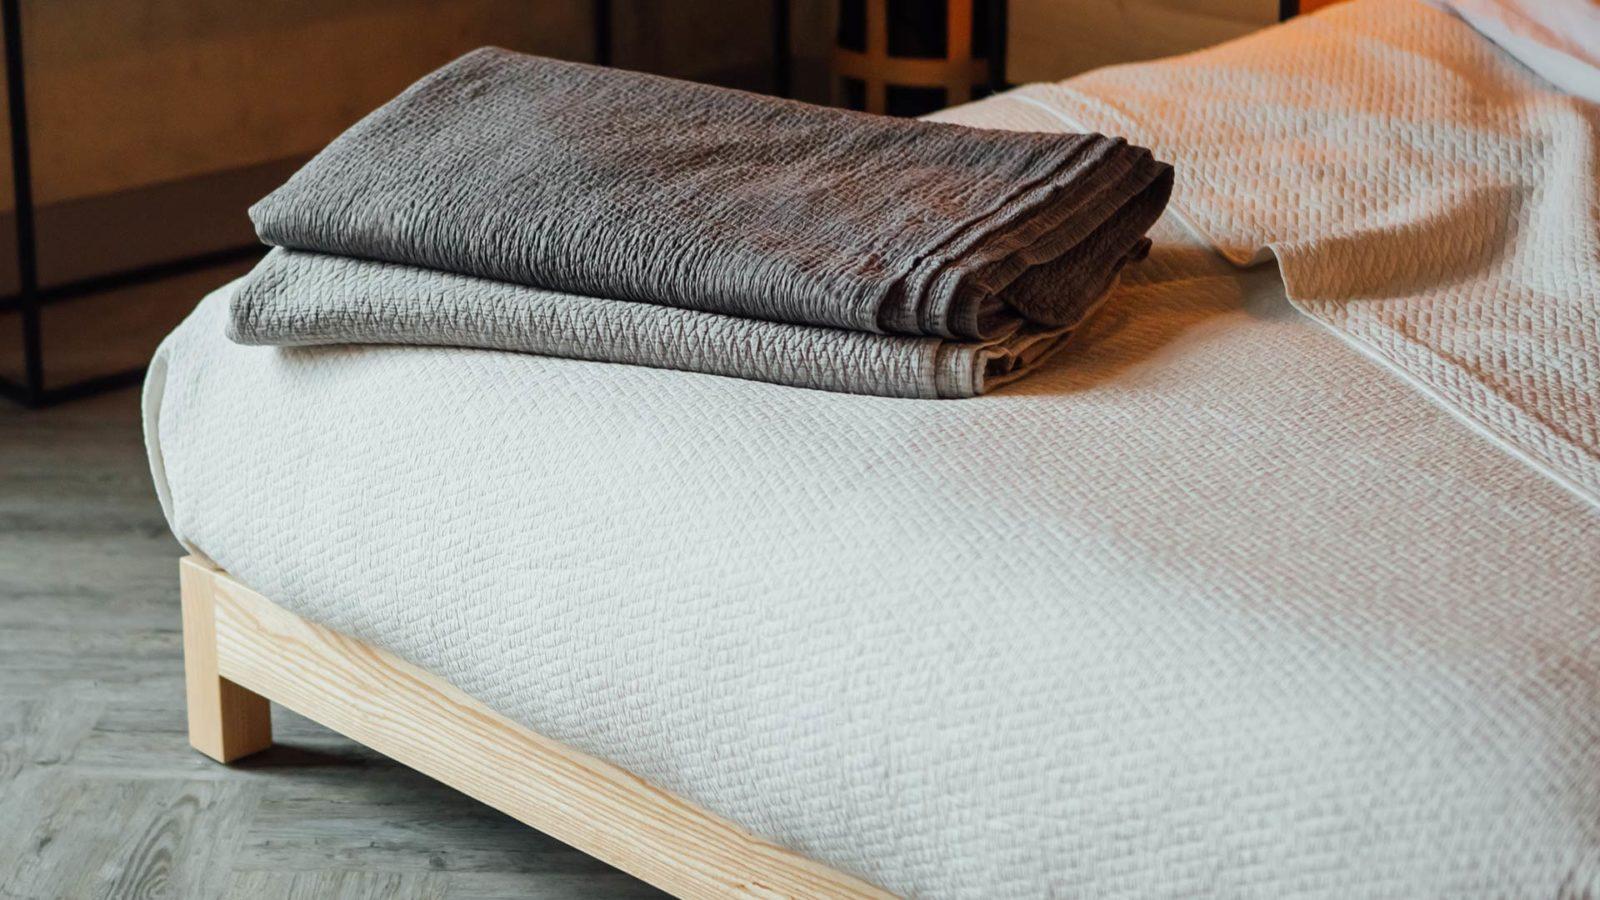 Textured bedspreads